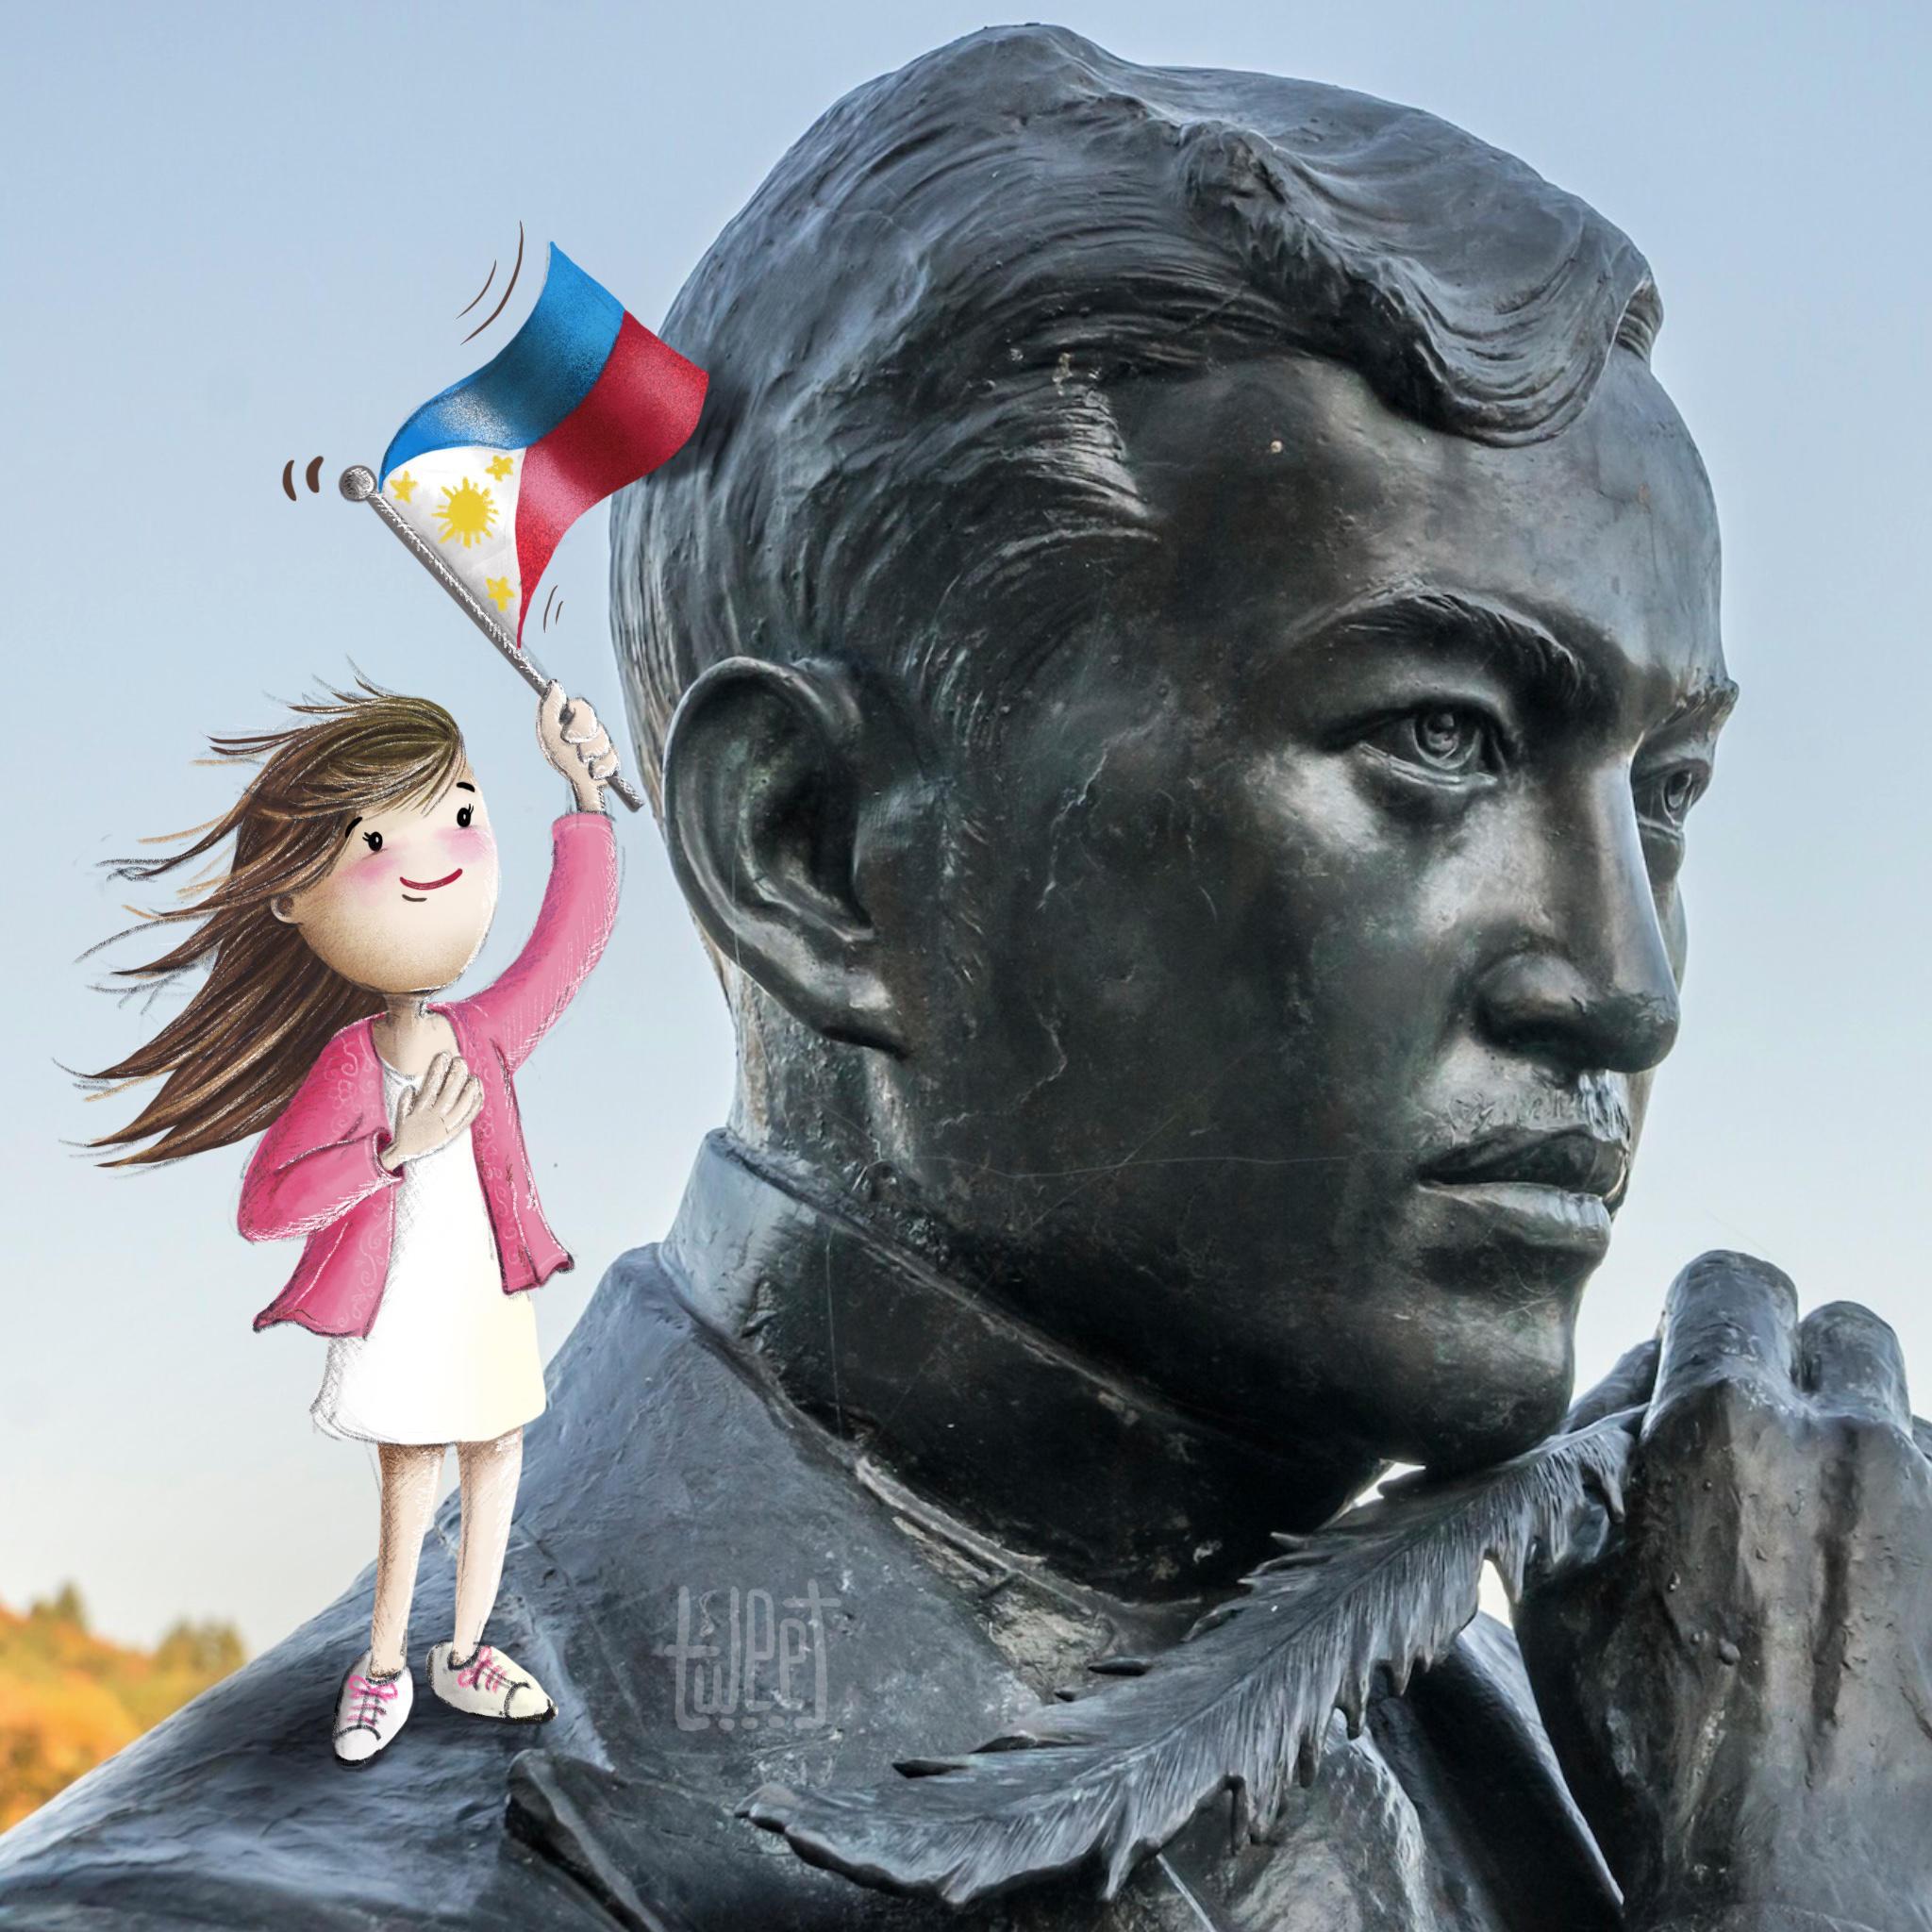 Photo Bombing - Jose Rizal, Heart of a Pinoy